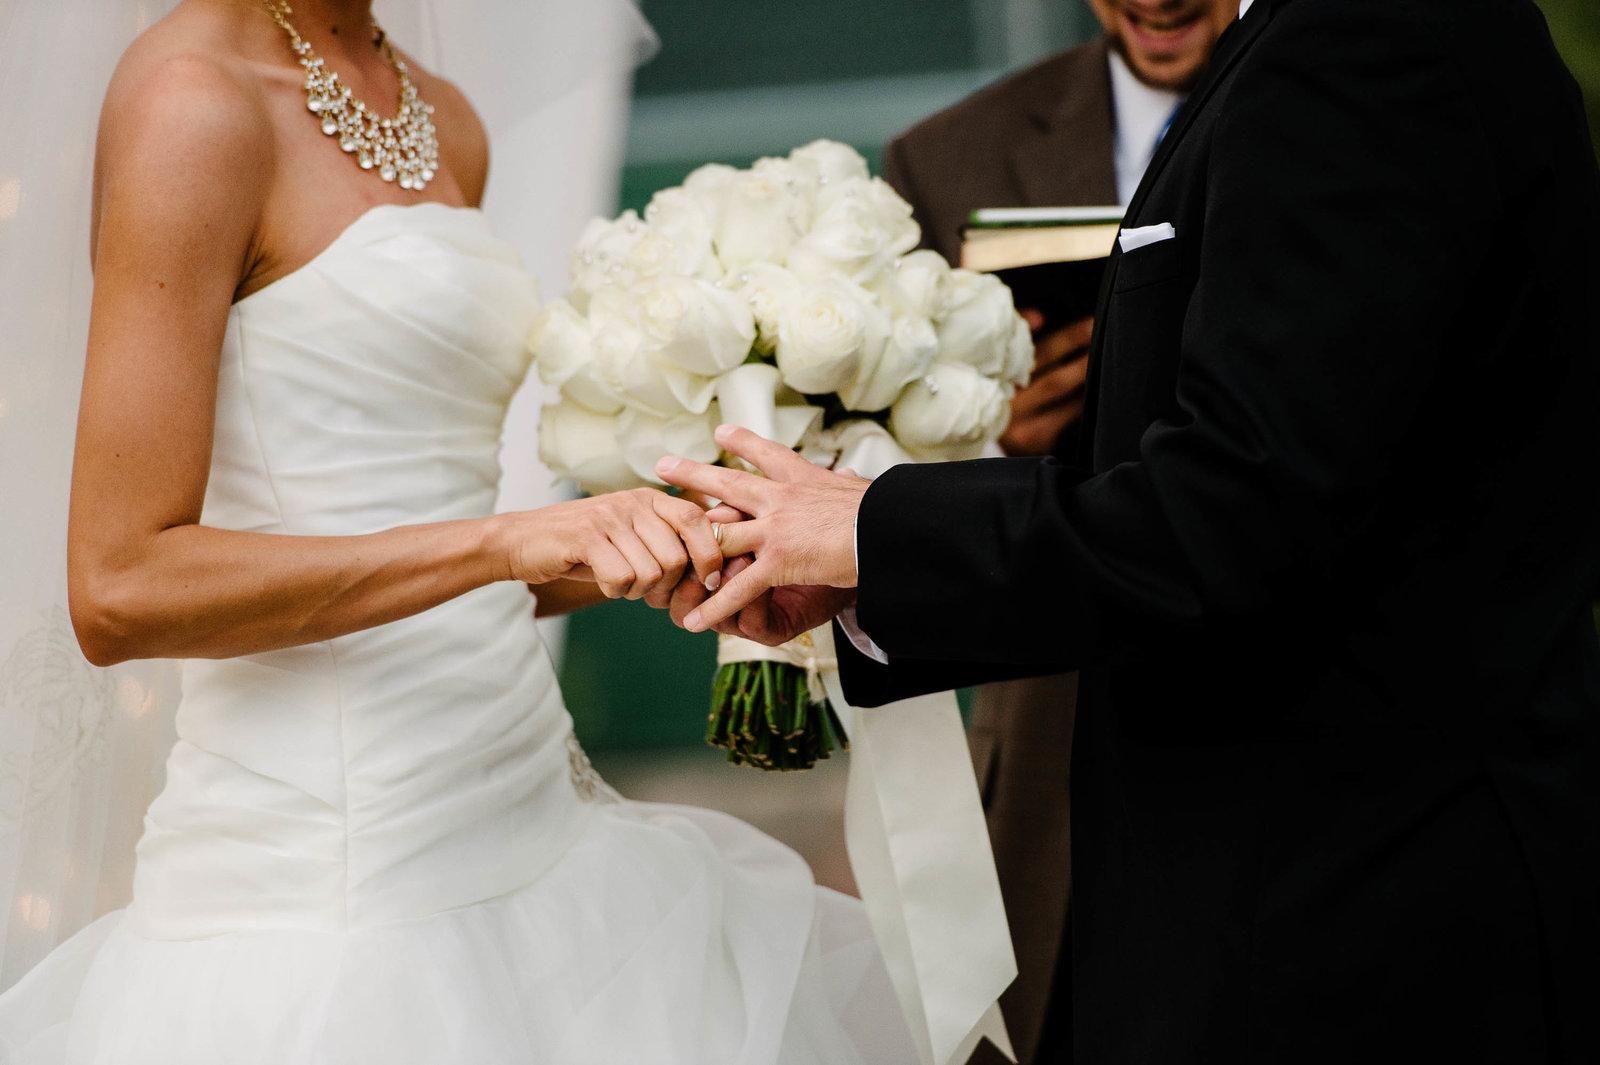 122-El-paso-wedding-photographer-El Paso Wedding Photographer_D45